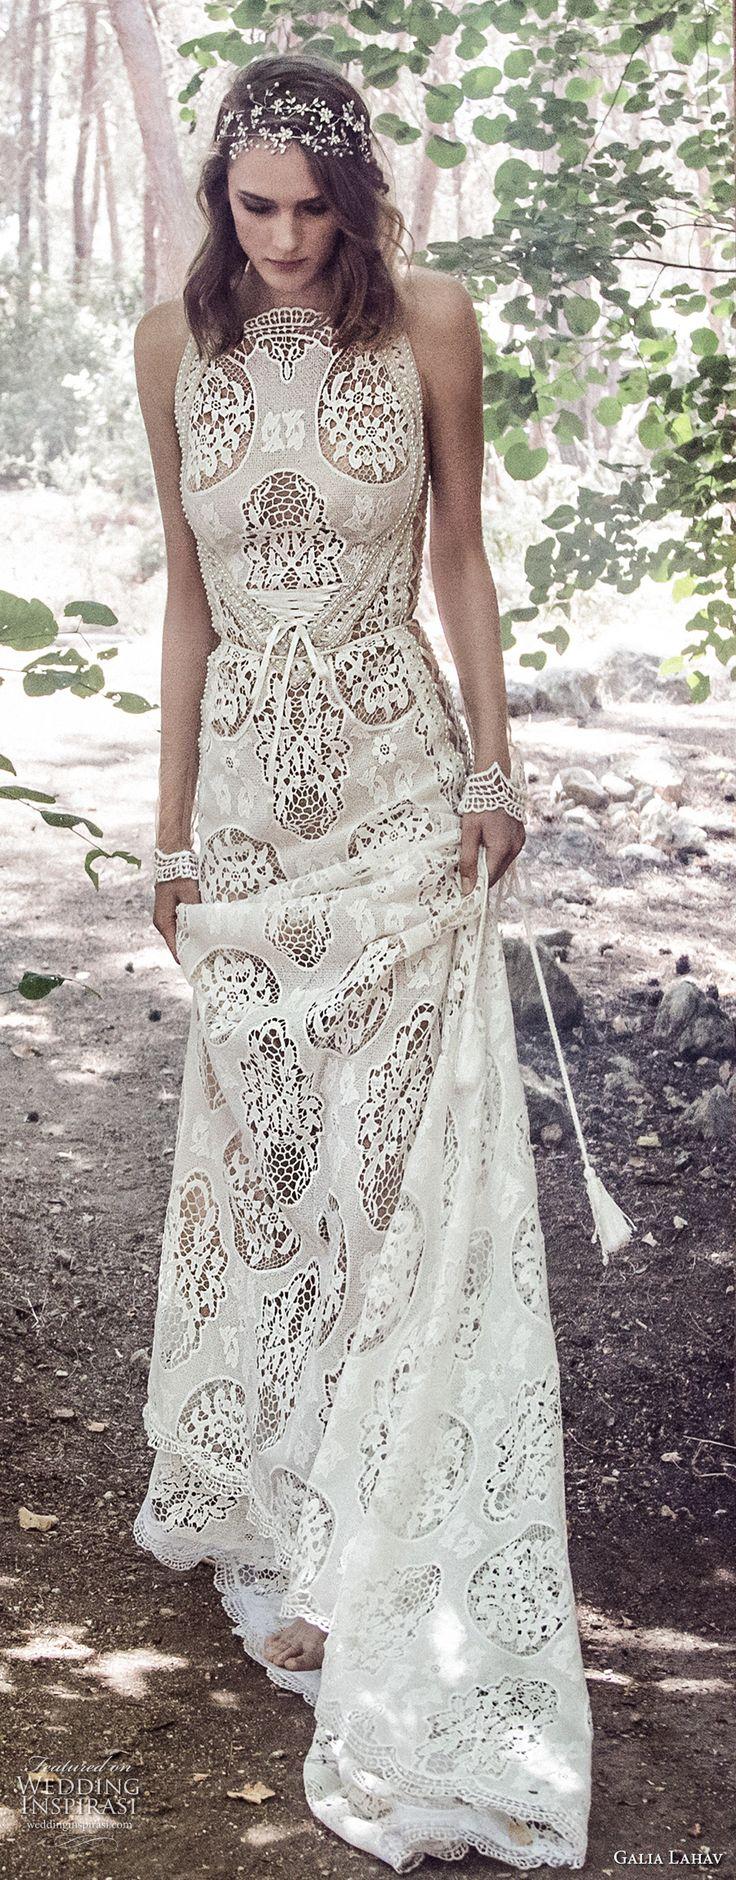 galia lahav gala 4 2018 bridal sleeveless halter neck full embellishment elegant bohemian soft a line wedding dress mid strap back short train (905) mv -- Gala by Galia Lahav 2018 Wedding Dresses